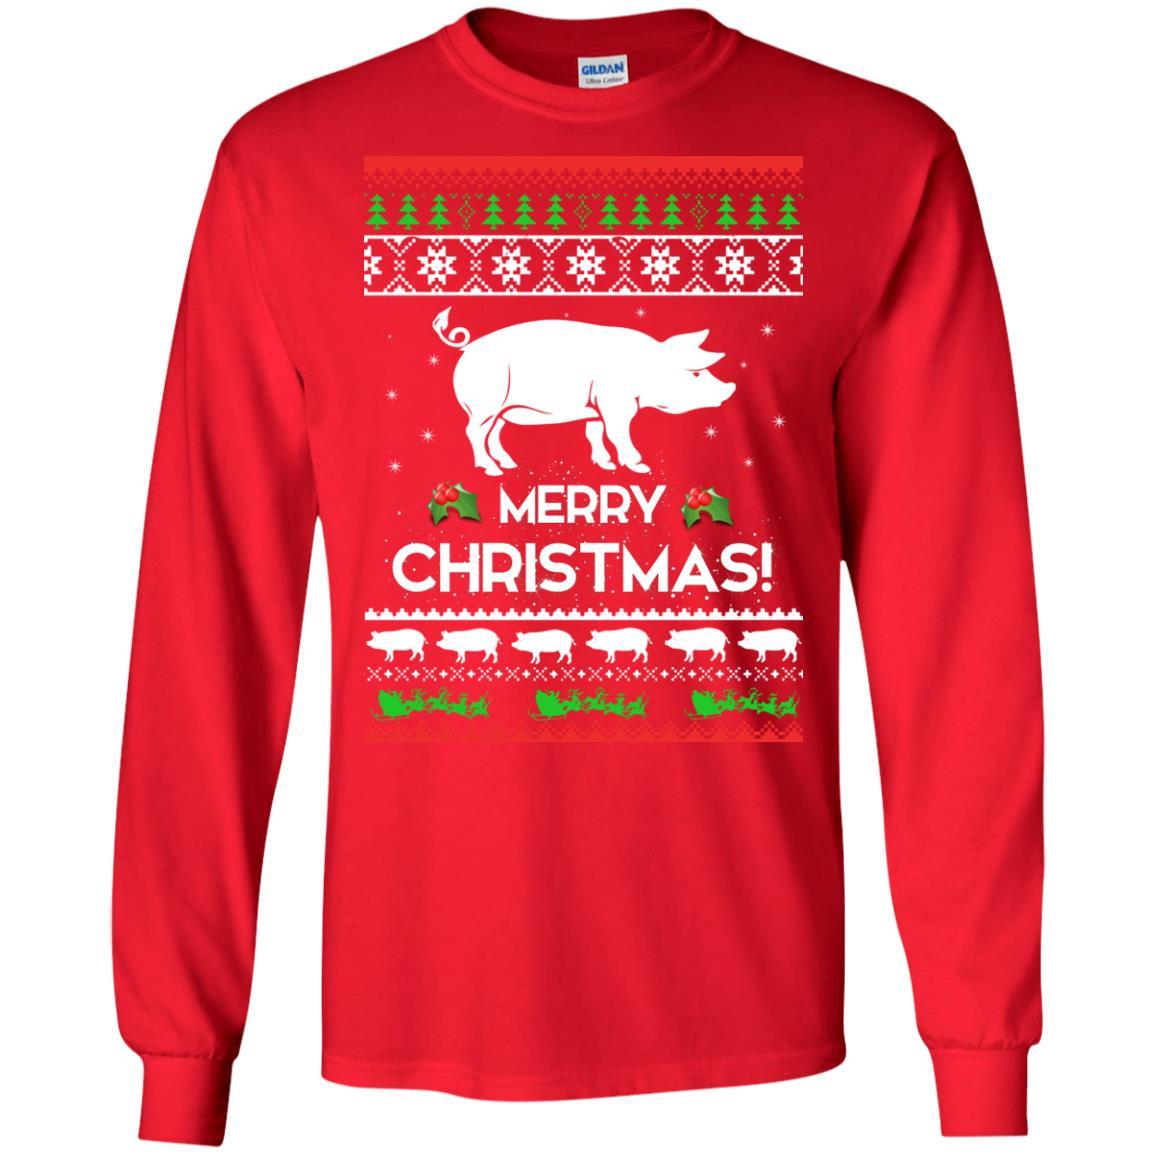 image 3874 - Merry Pigmas Christmas Pig Ugly Sweater, Shirt